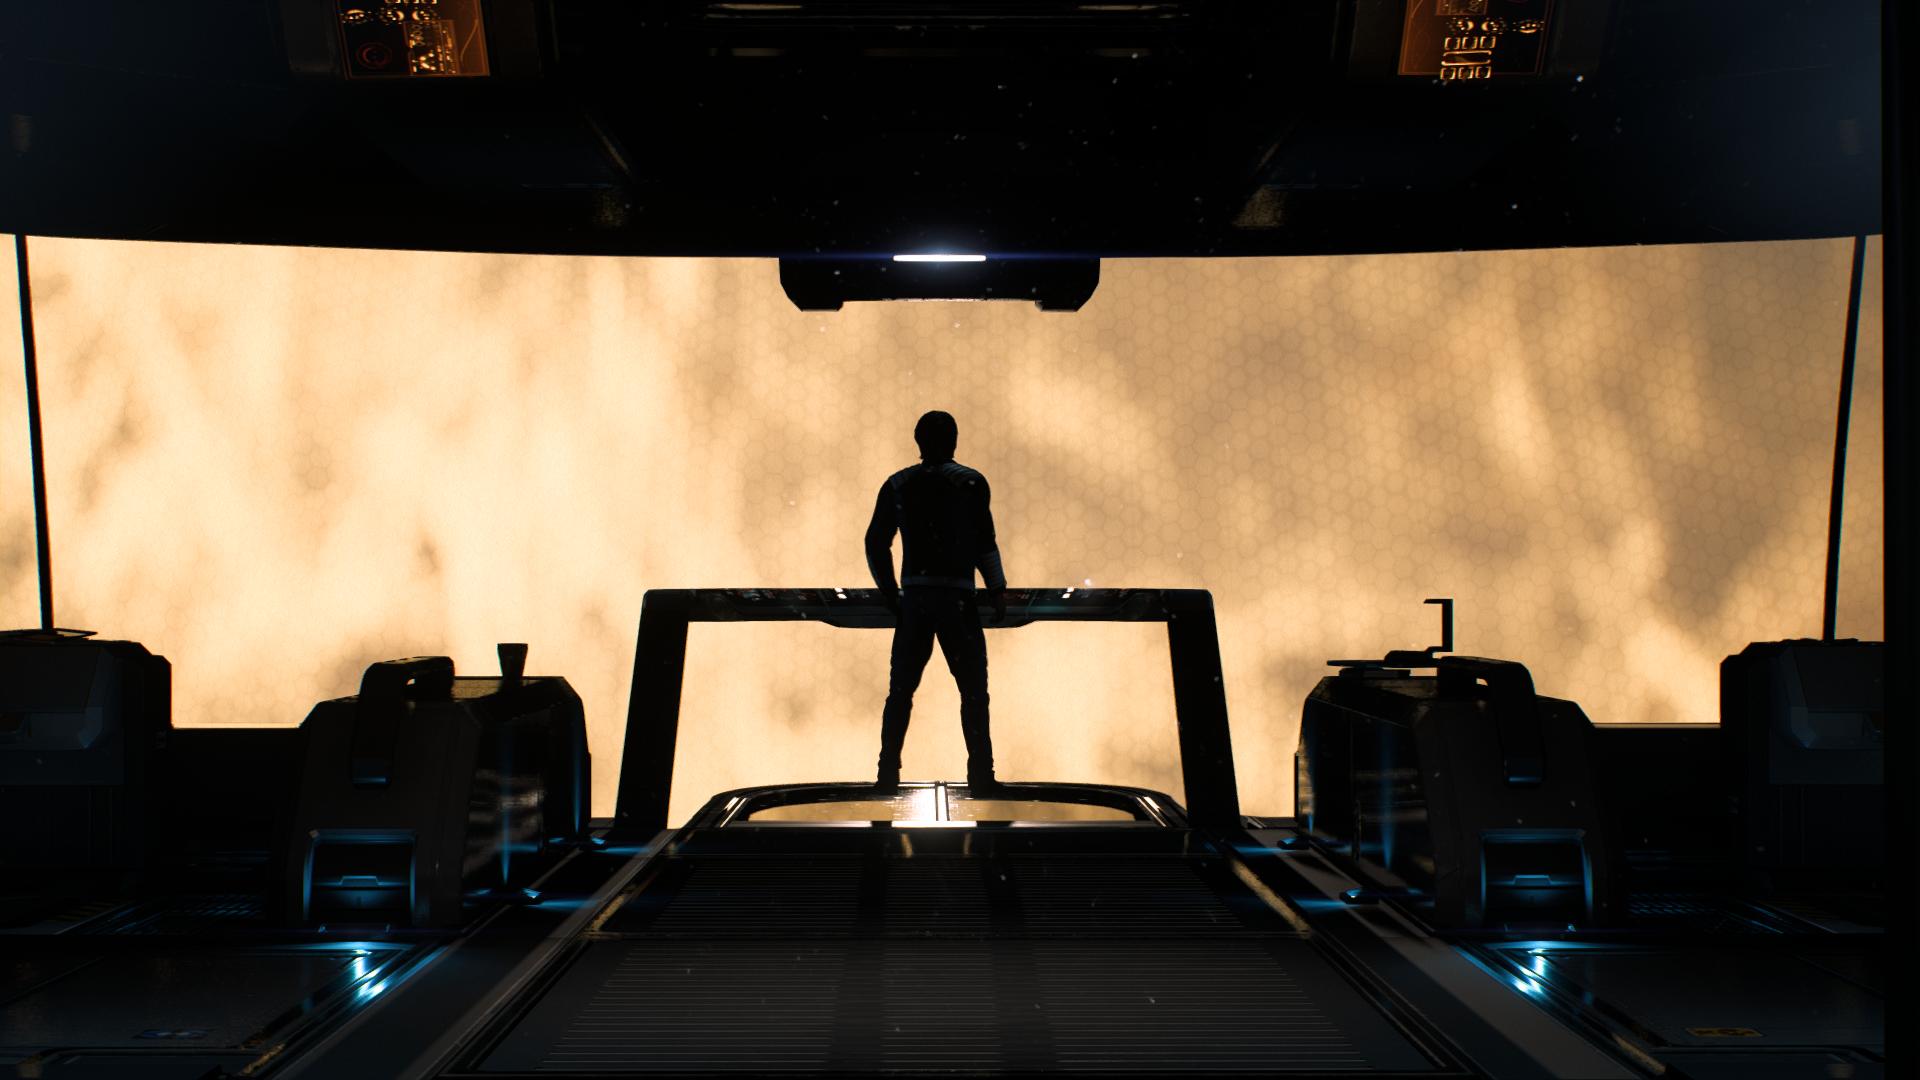 Mass Effect Andromeda_Cinetools_0001_JTC.png